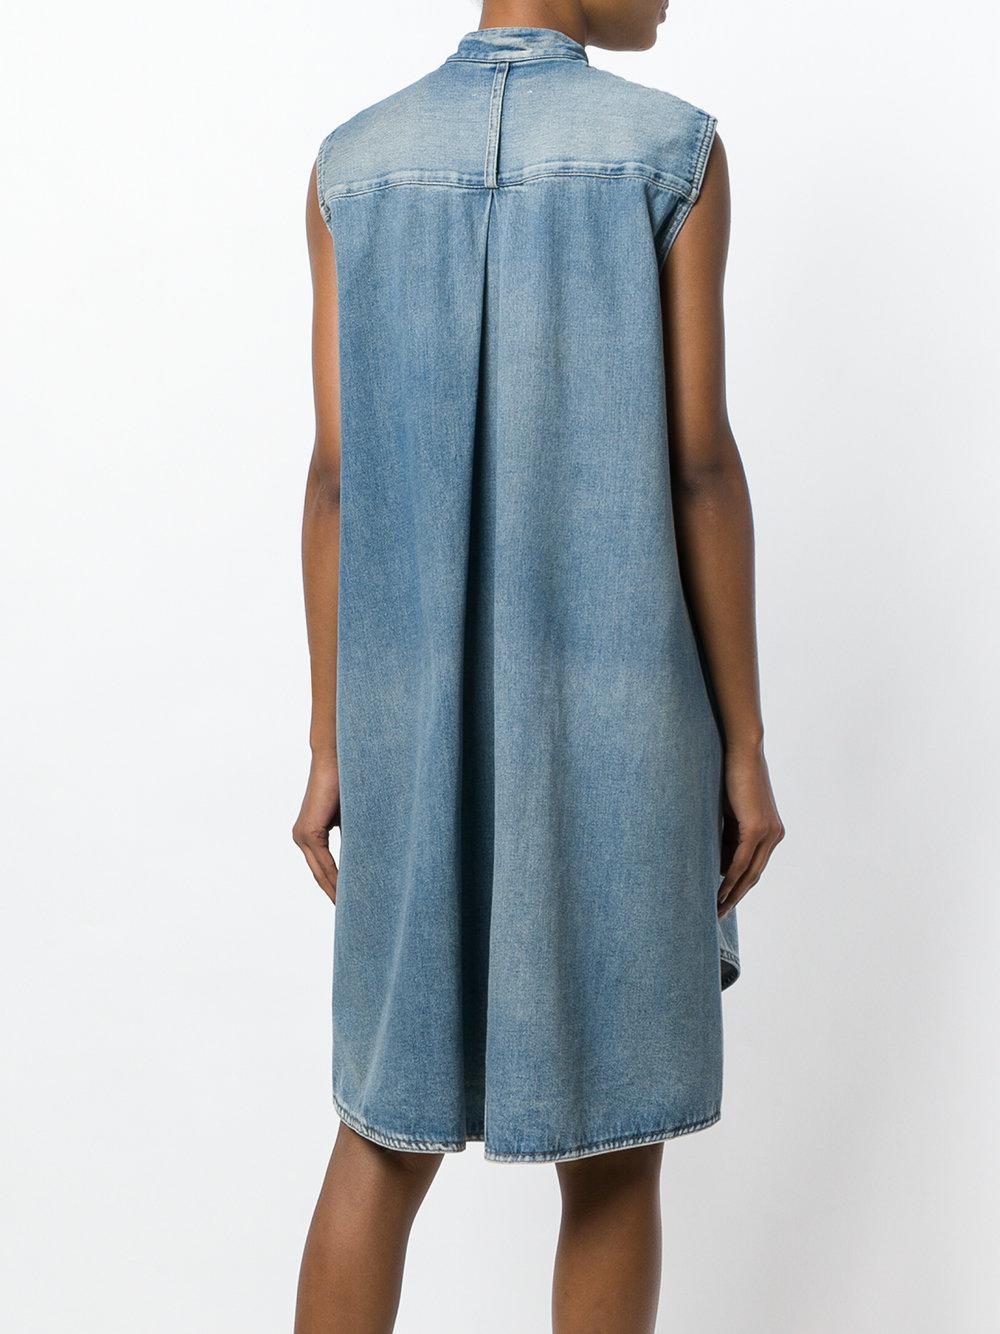 shift denim shirt dress - Blue Maison Martin Margiela Mup4wKjIN